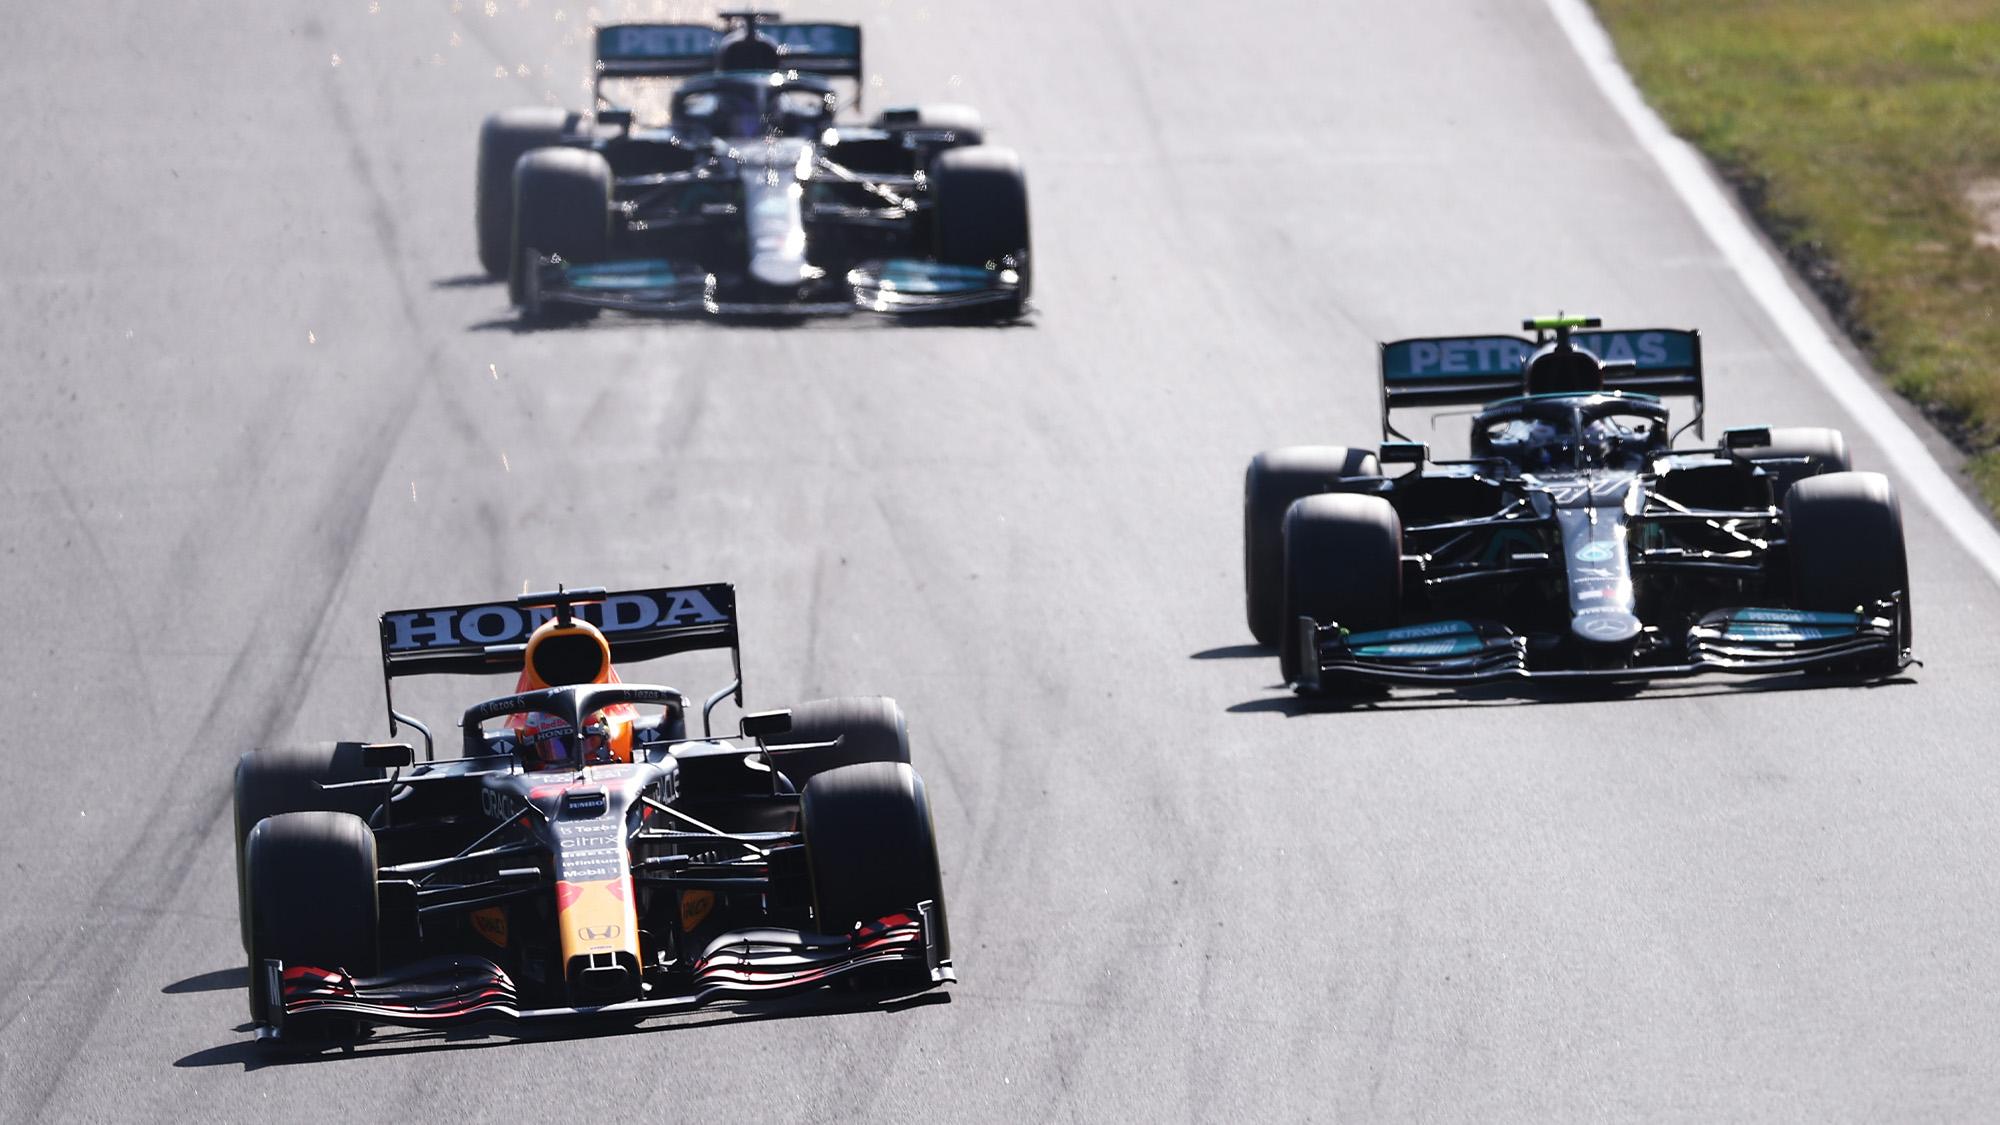 Max Verstappen passes Valtteri Bottas in the 2021 Dutch Grand Prix